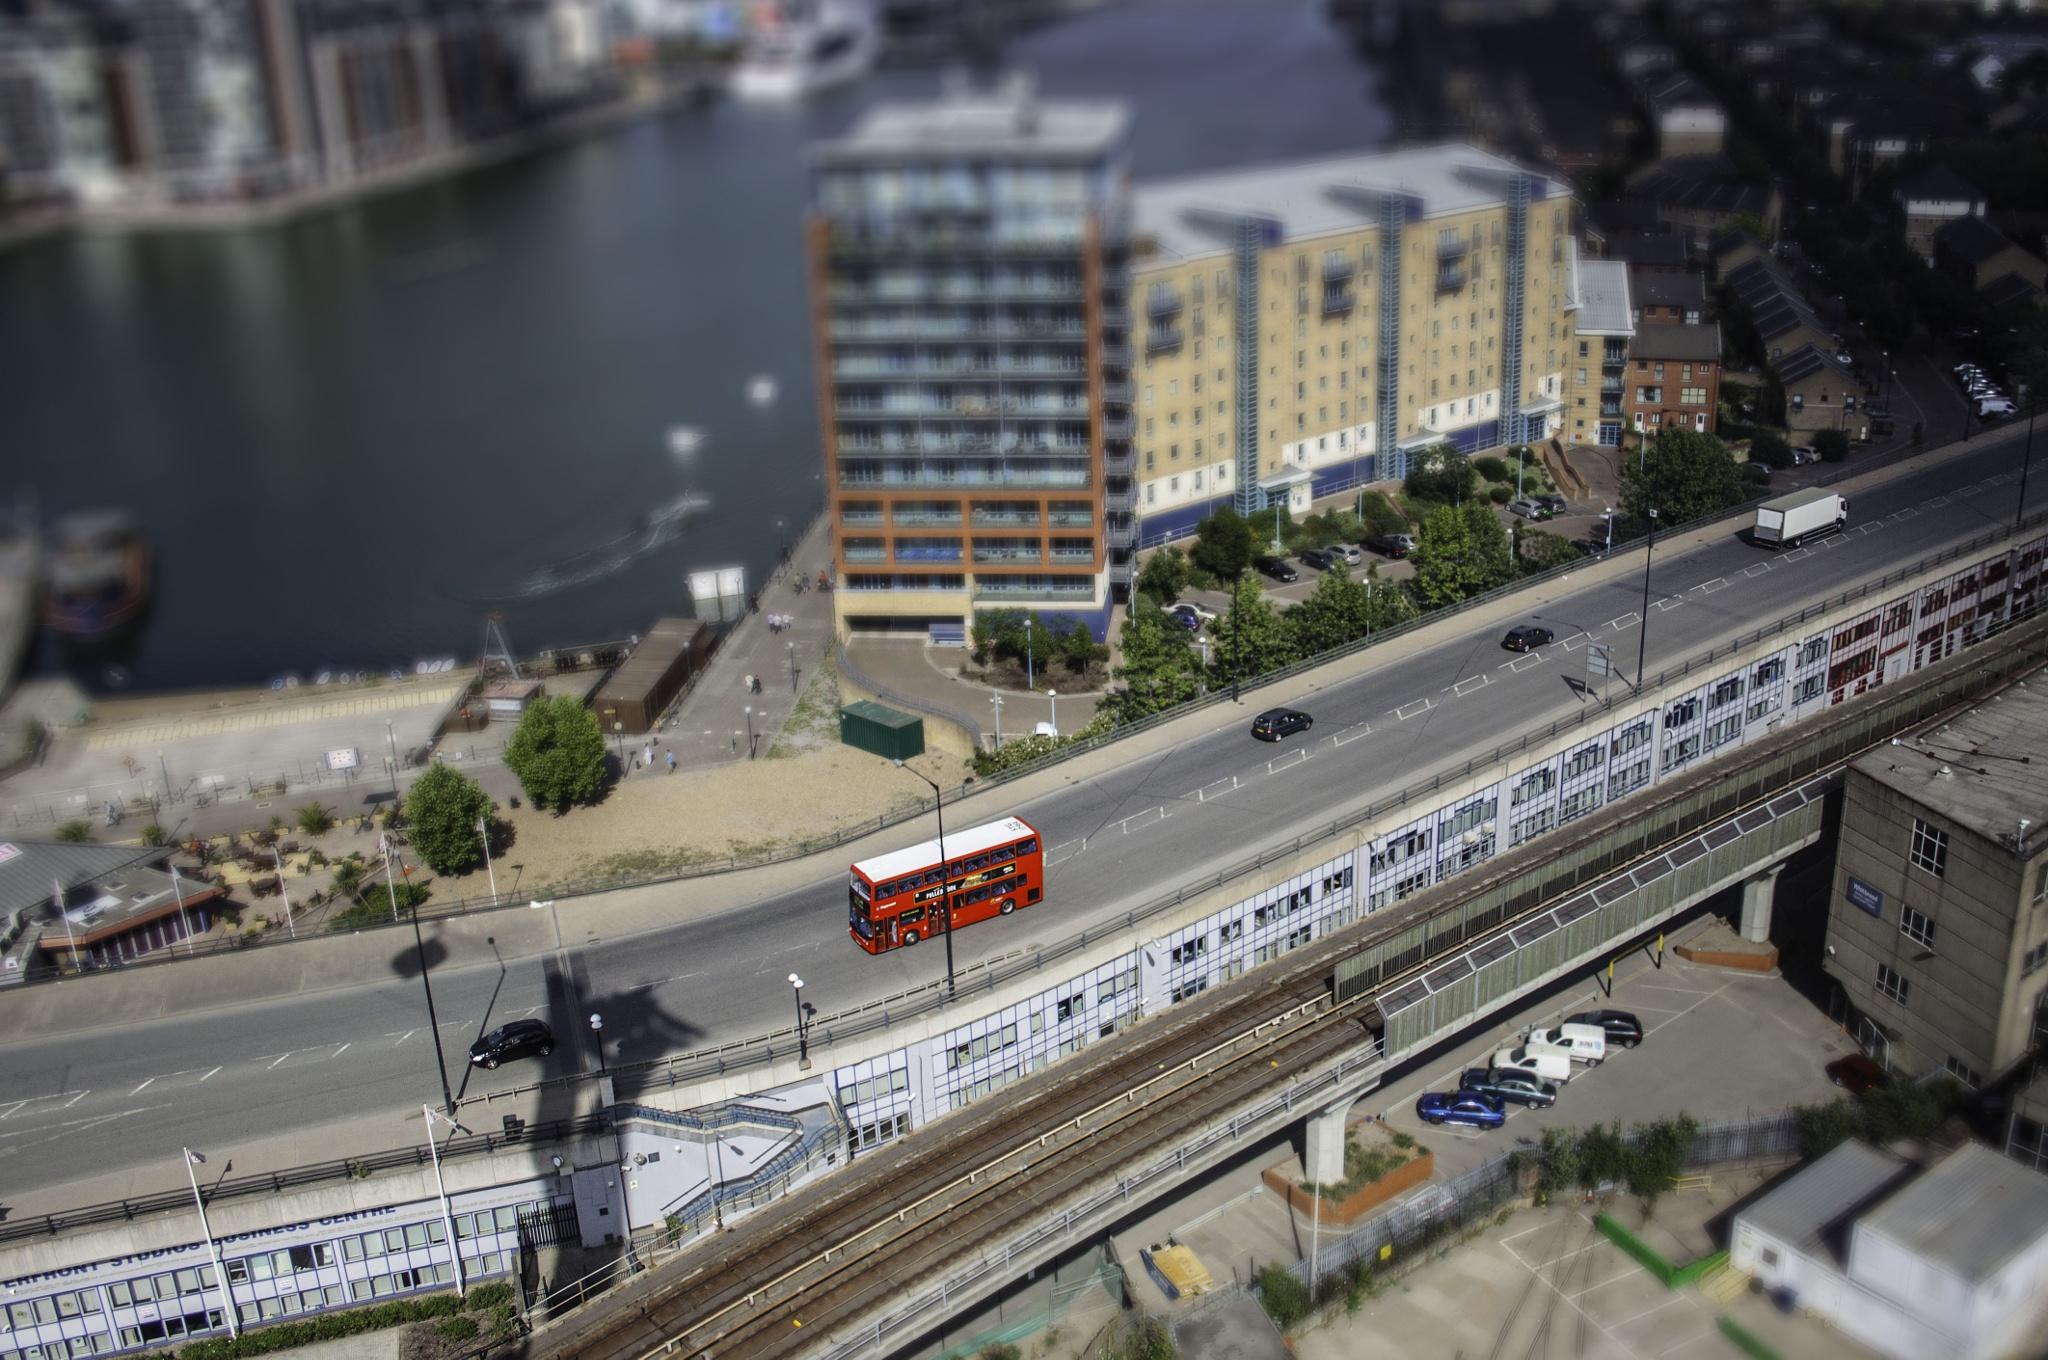 Toy London by Andy McLellan